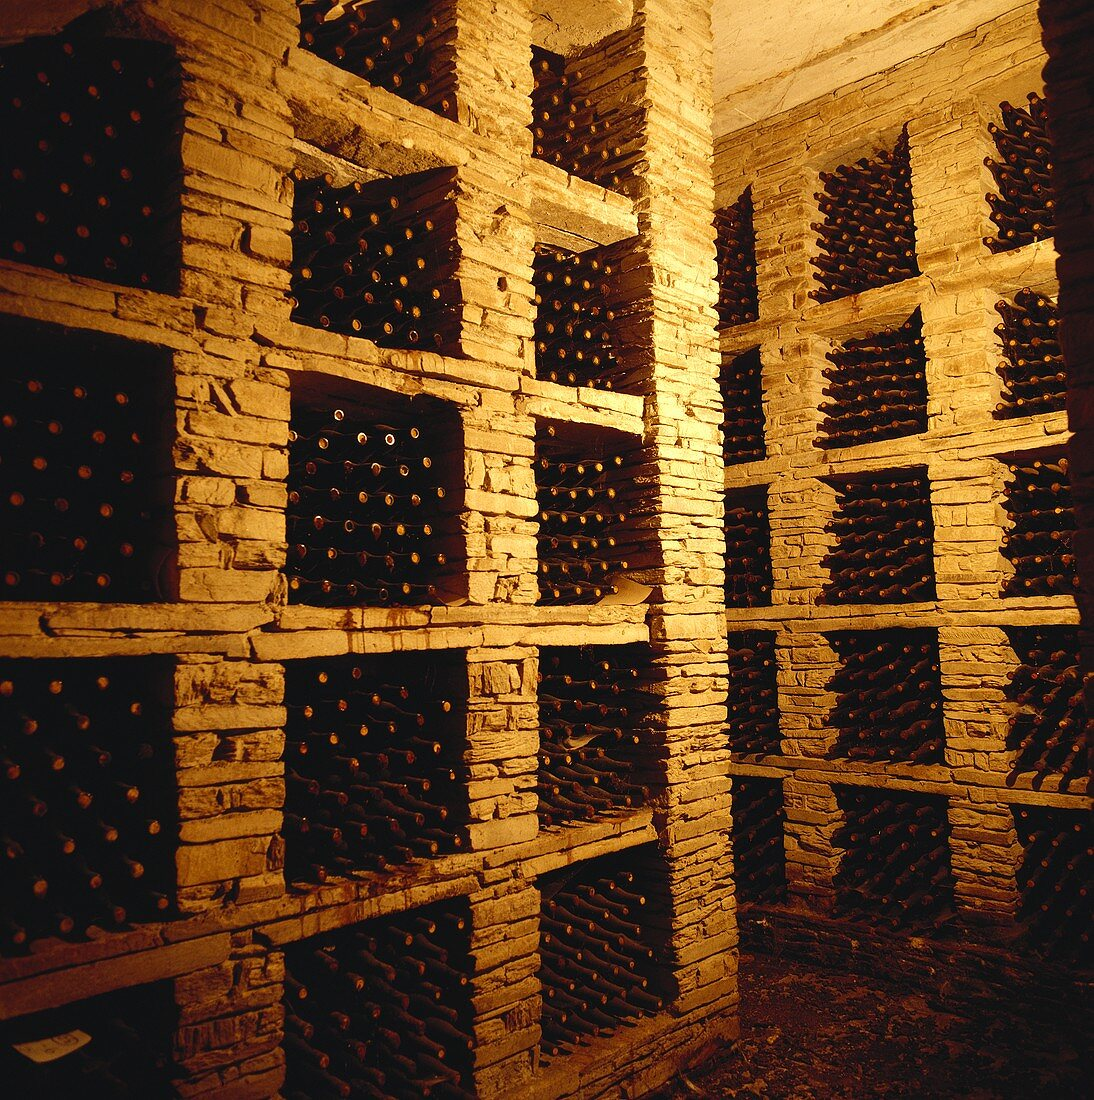 Bottle store at Tsantali Wine Estate, Agios Pavlos, Greece